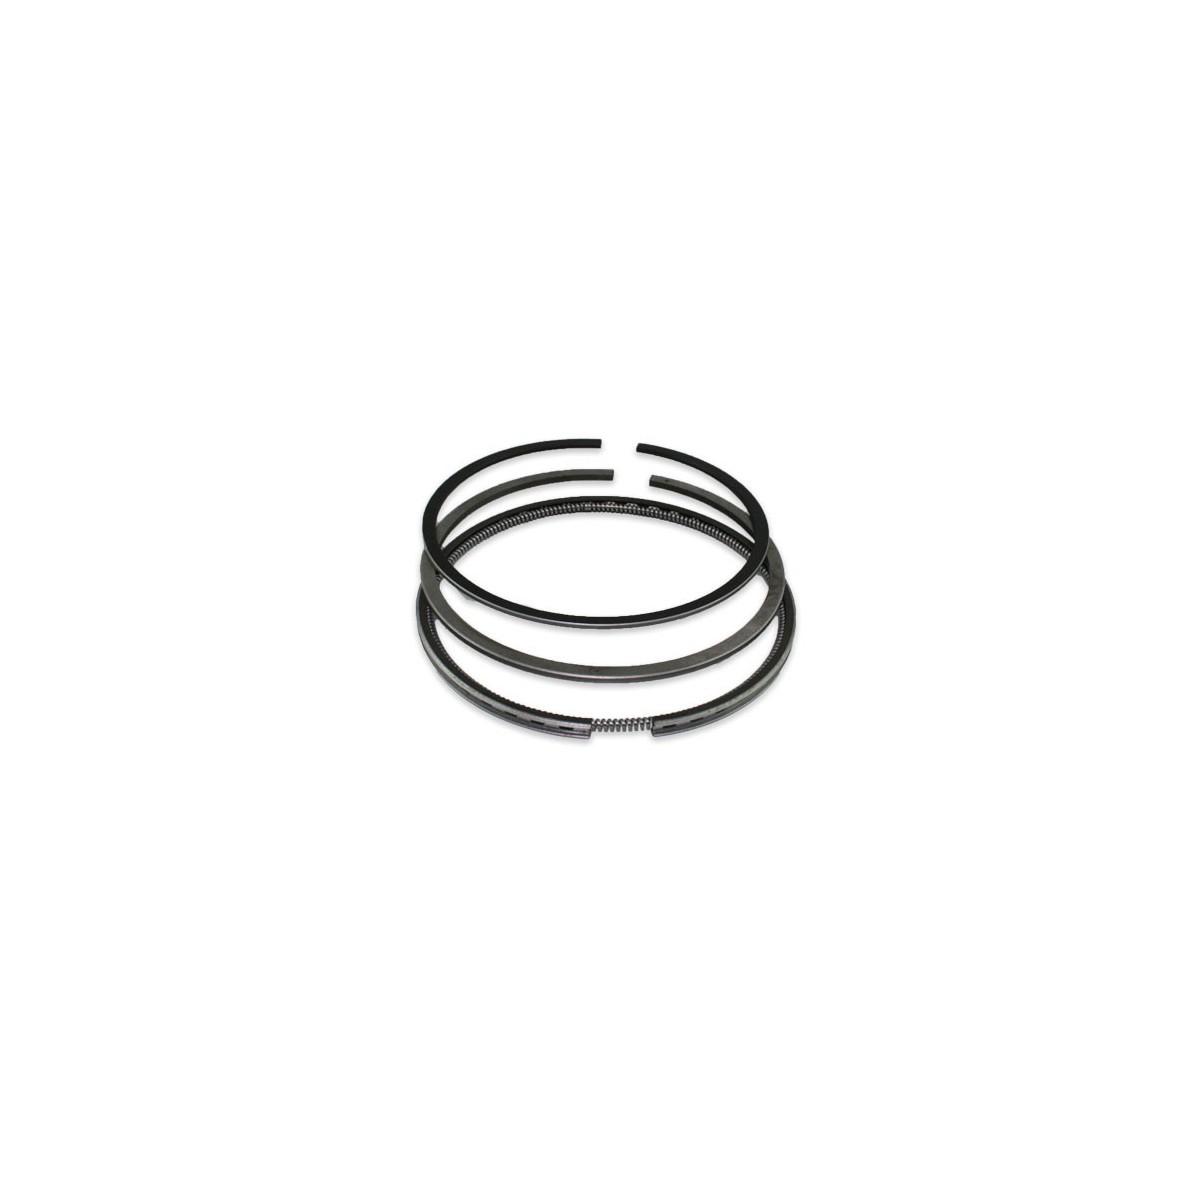 Piston ring set YANMAR 2010, Shibaura D258F,   72935122500  STD